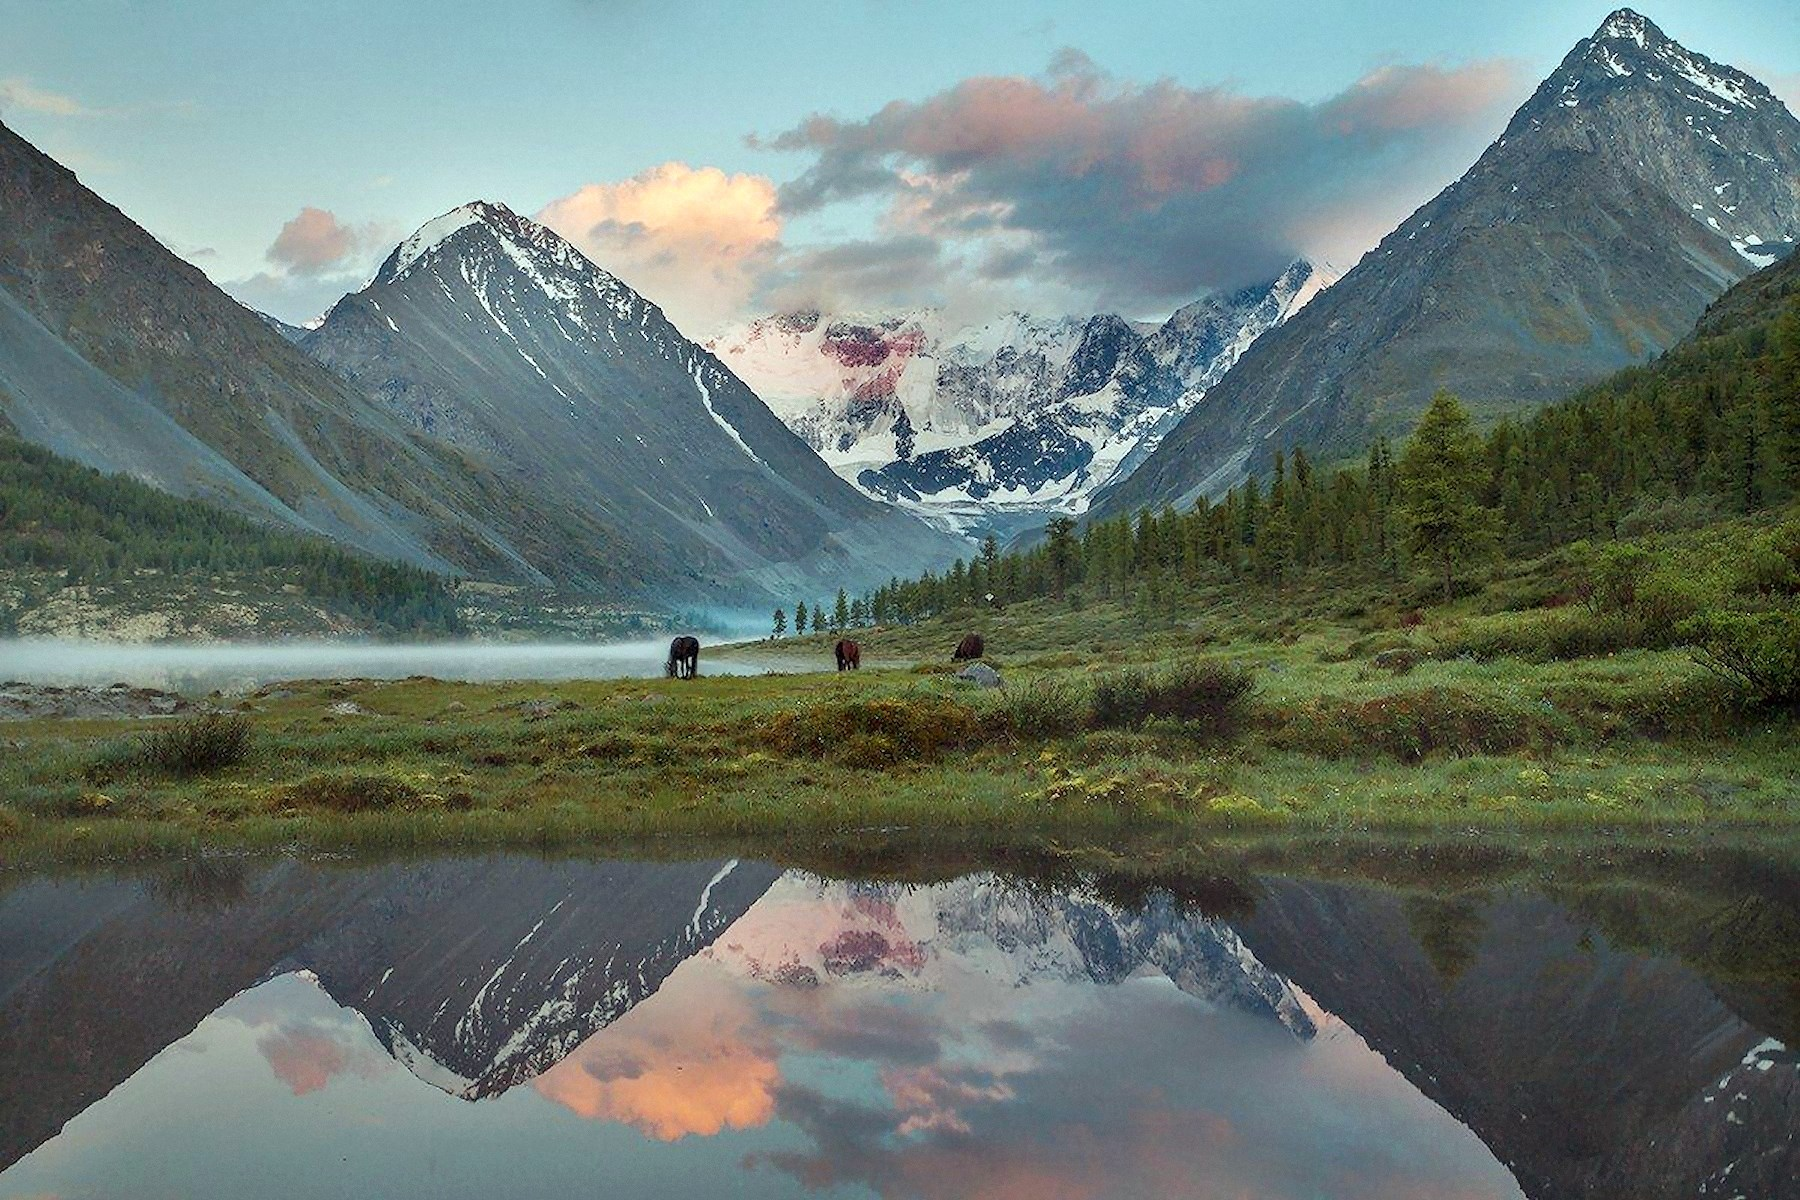 00 Valentina Kobzeva. Akkem Lake by Mount Belukha in the Altai Mountains. 2015